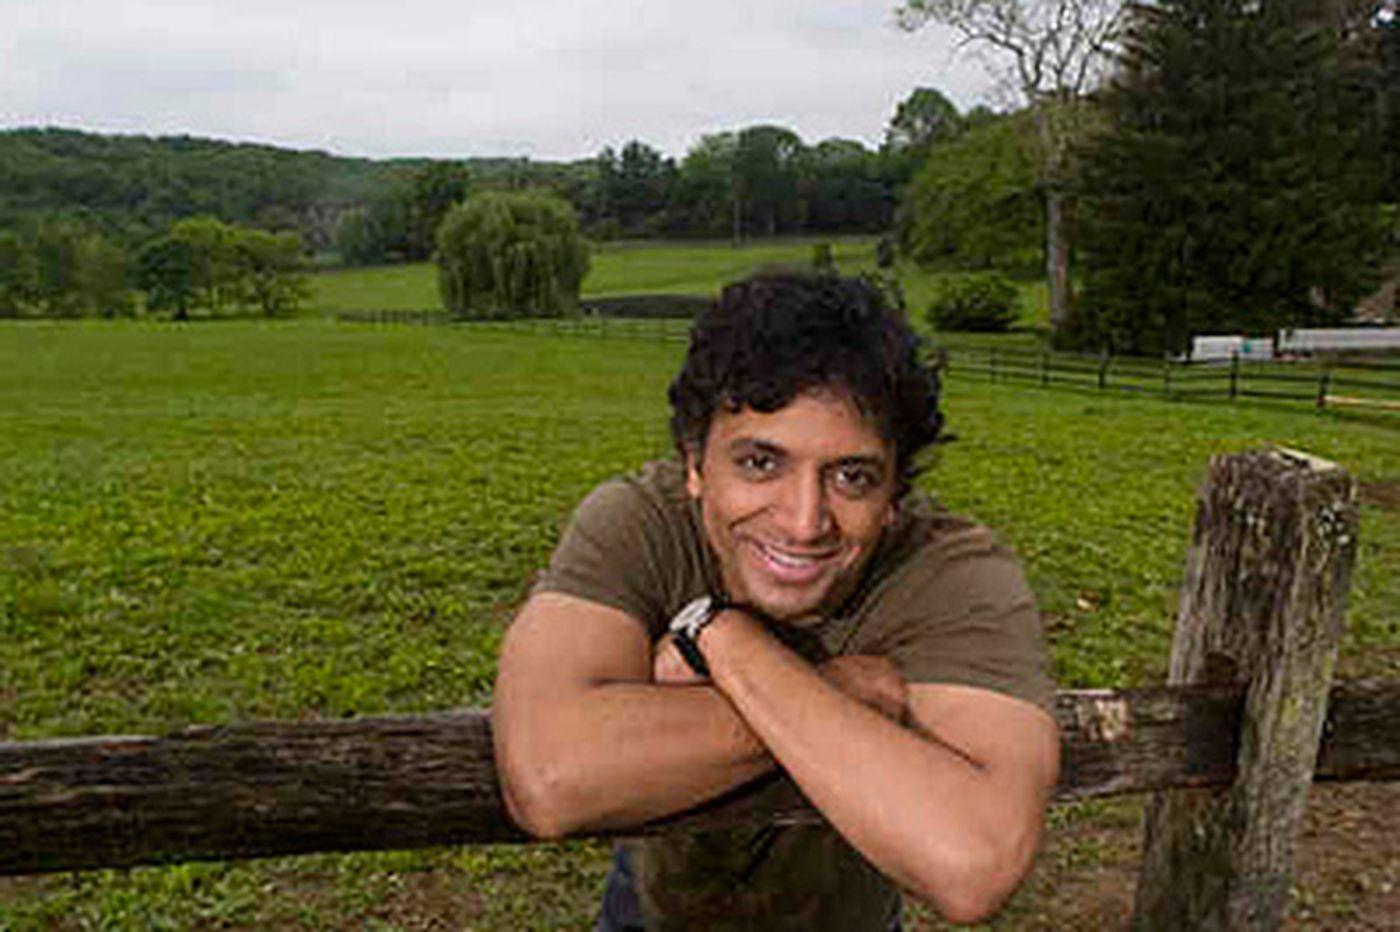 State budget impasse chases Shyamalan film to Canada